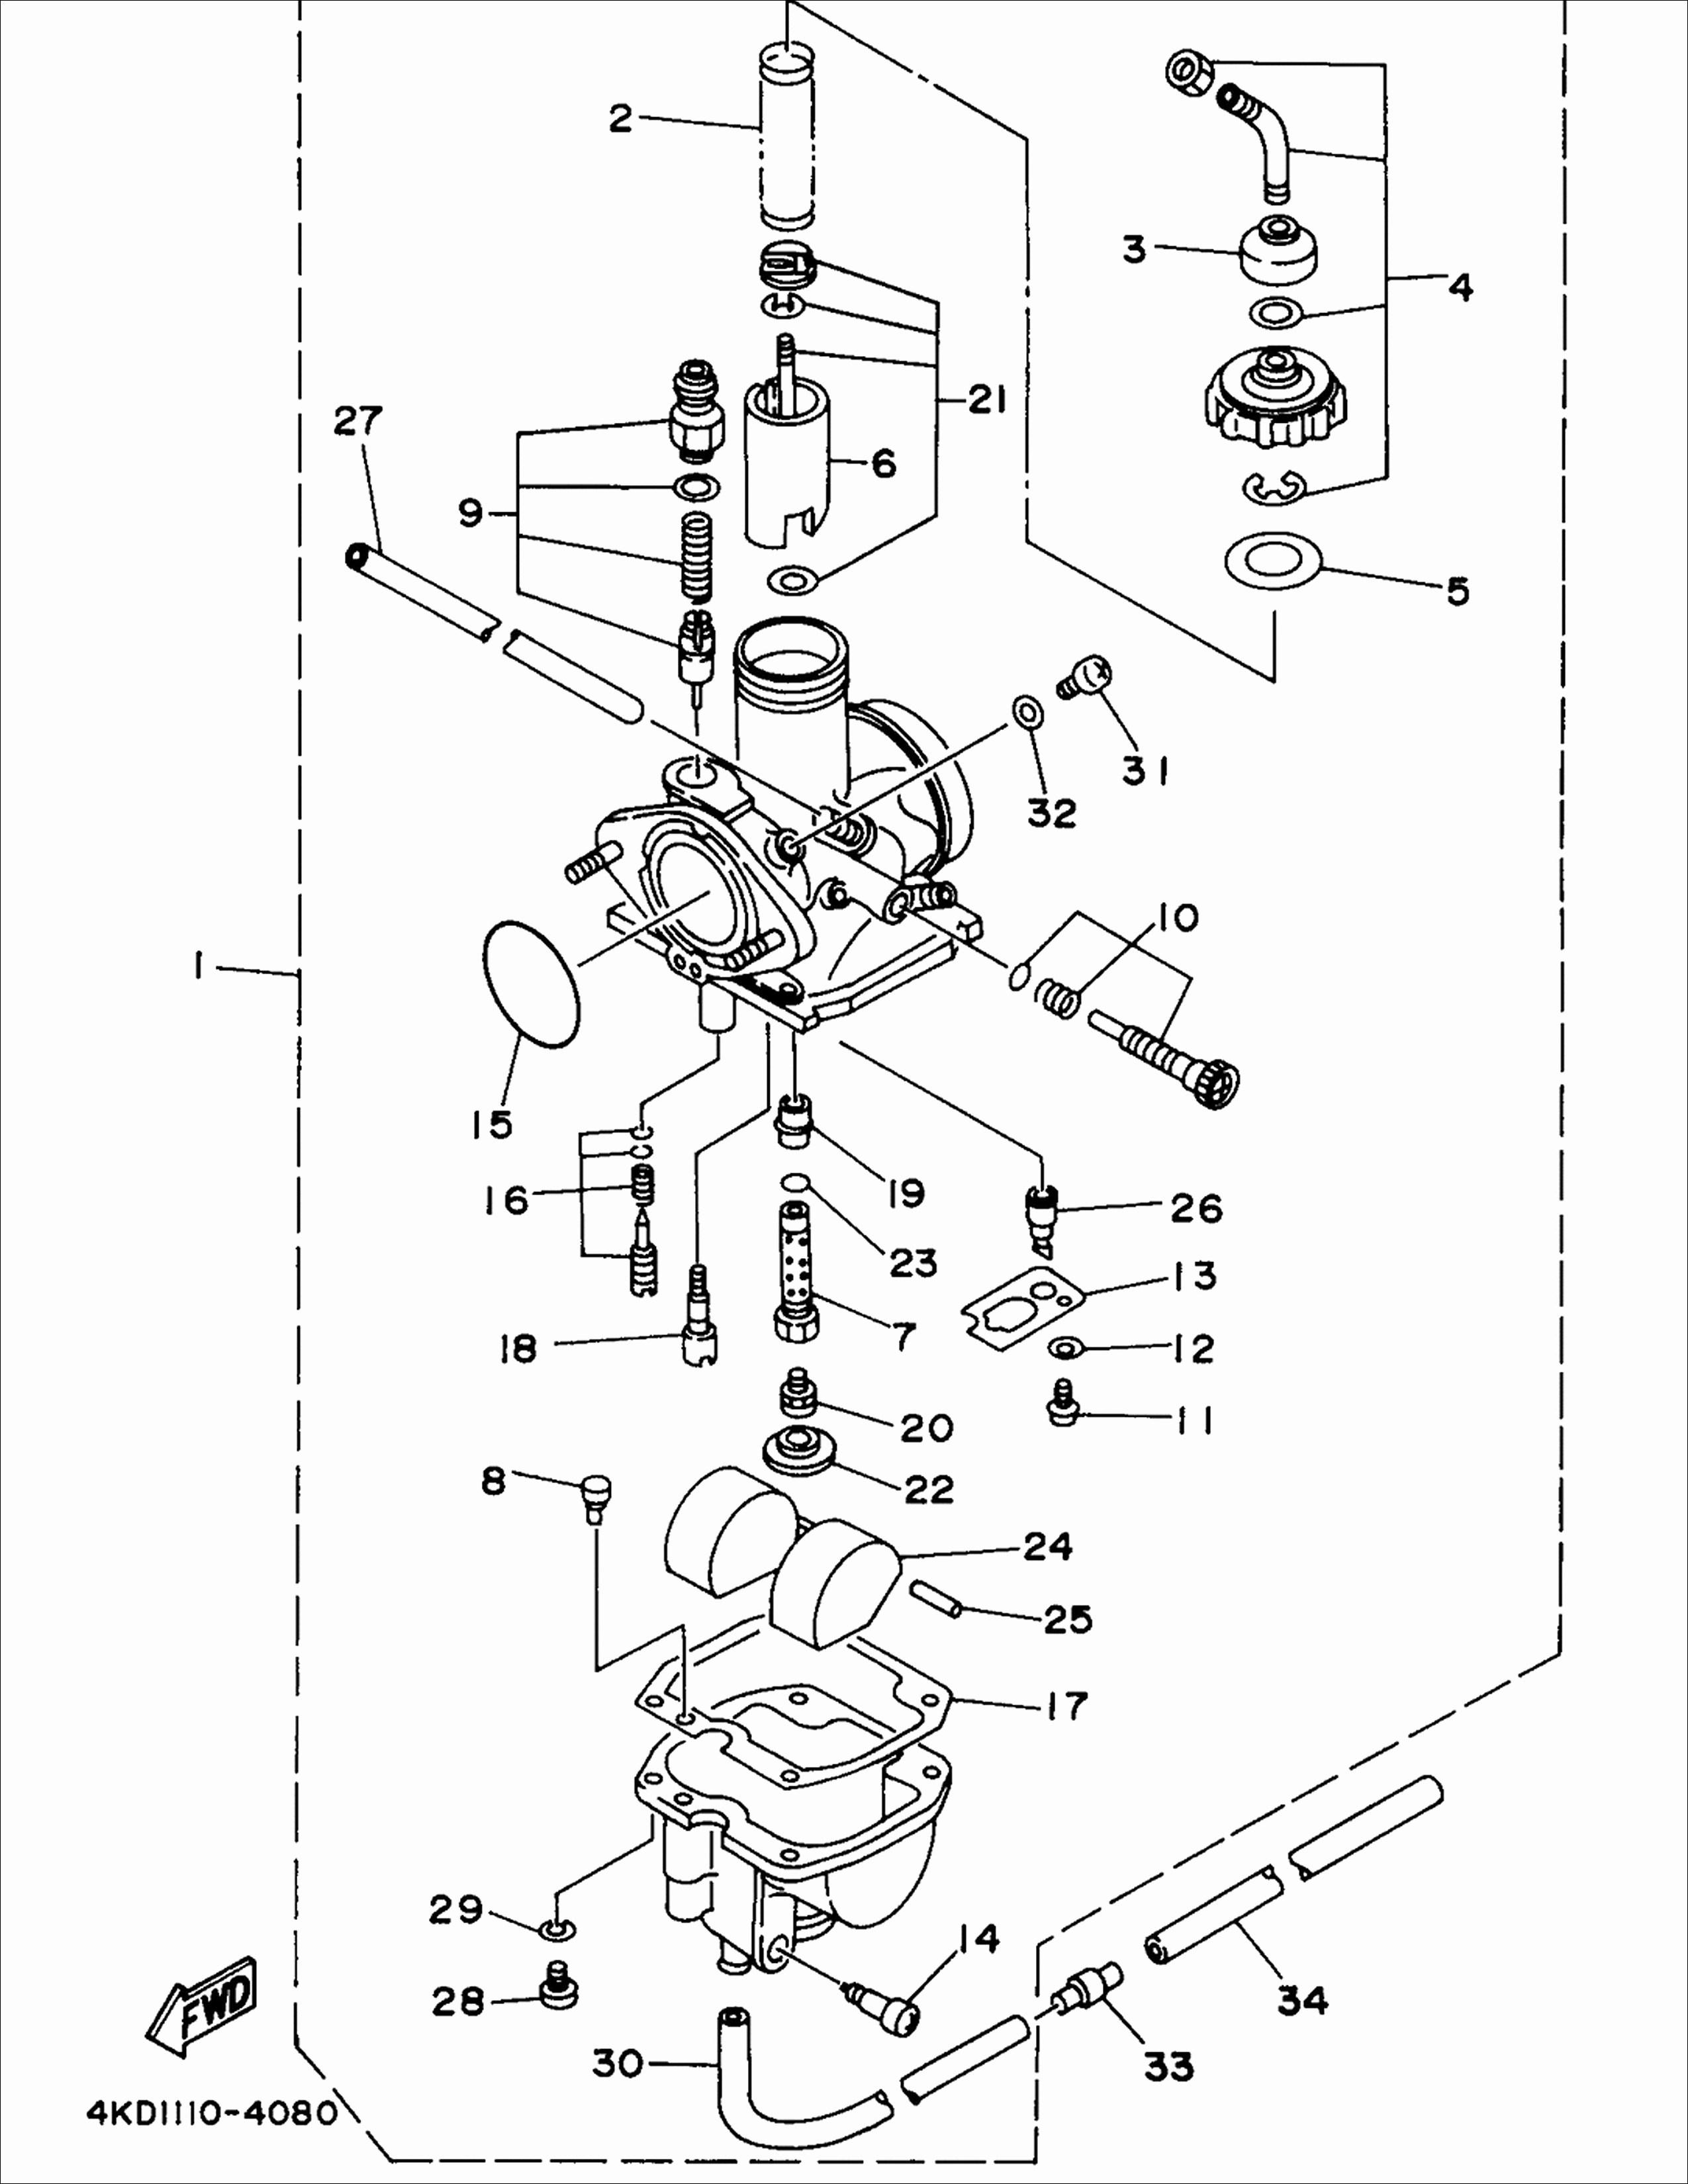 Fxef Wiring Diagram - Auto Electrical Wiring Diagram - Harley Davidson Headlight Wiring Diagram